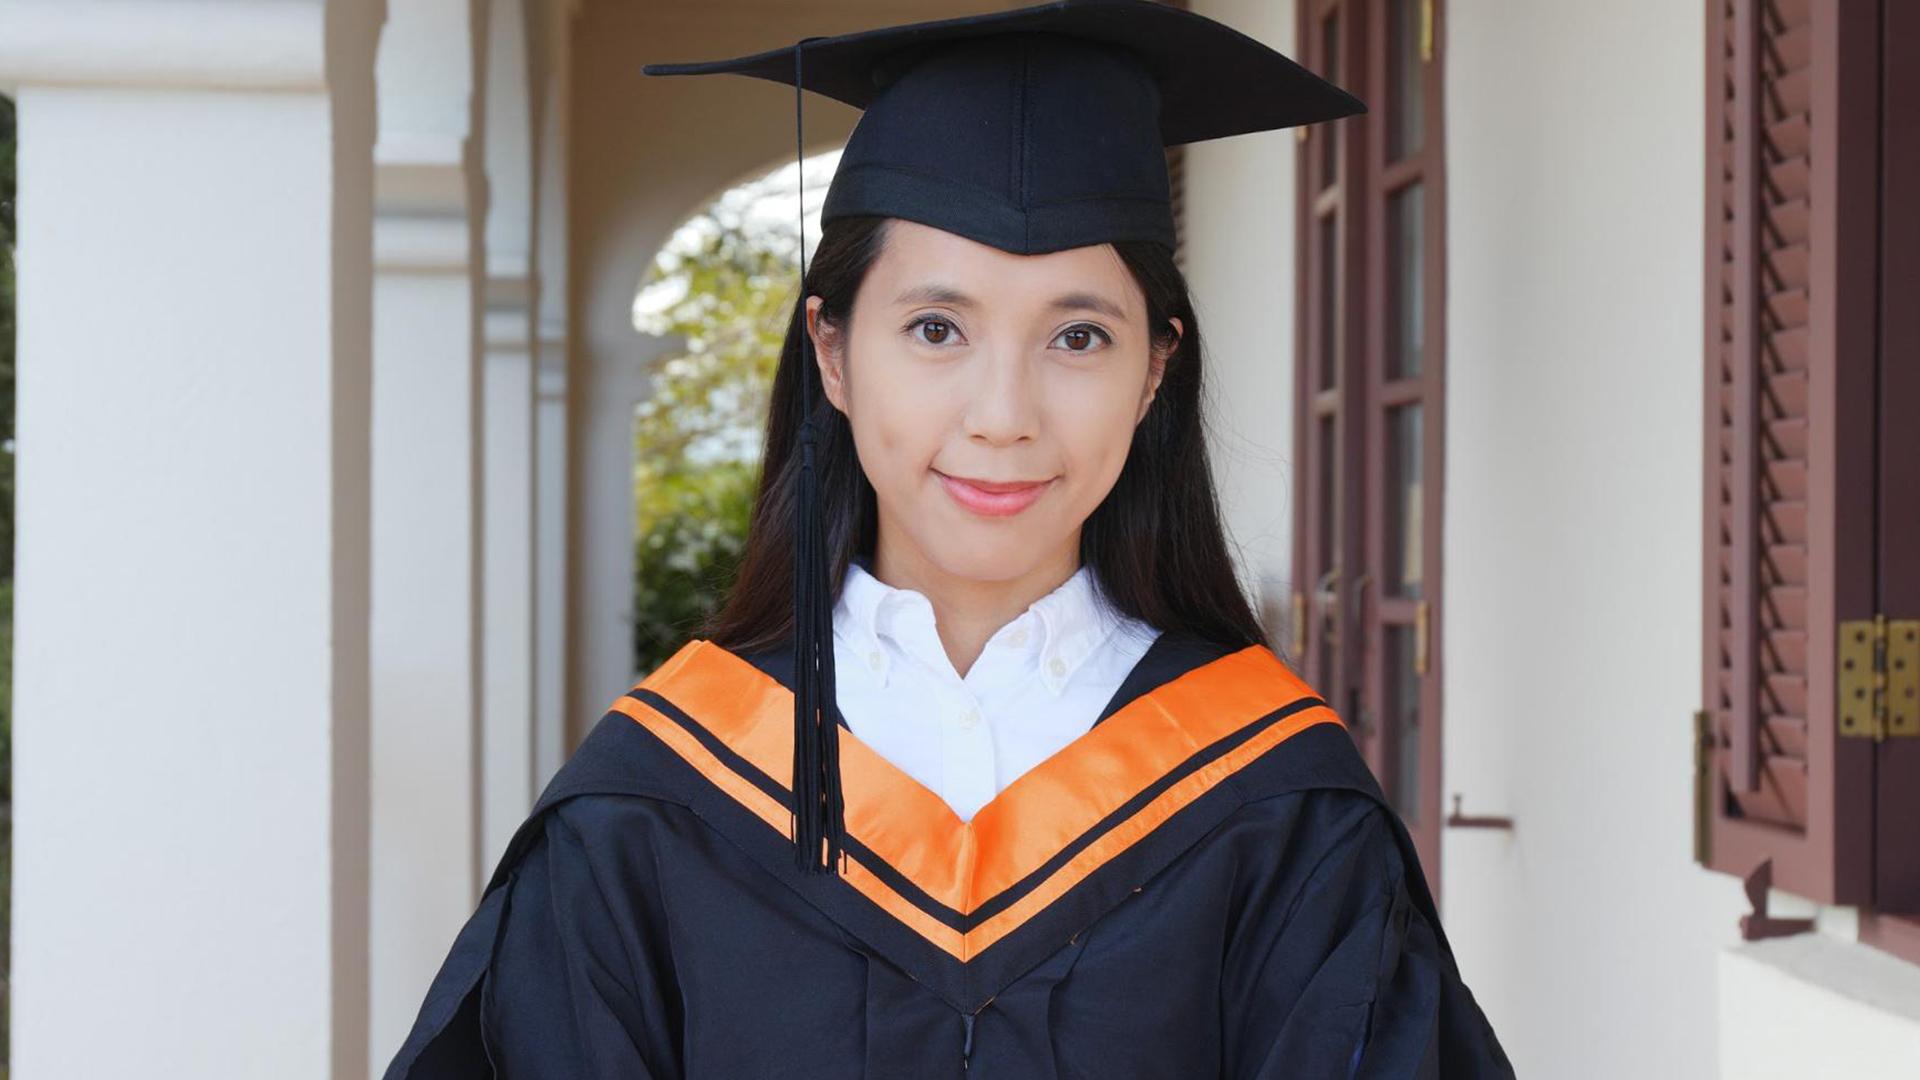 A graduate smiling